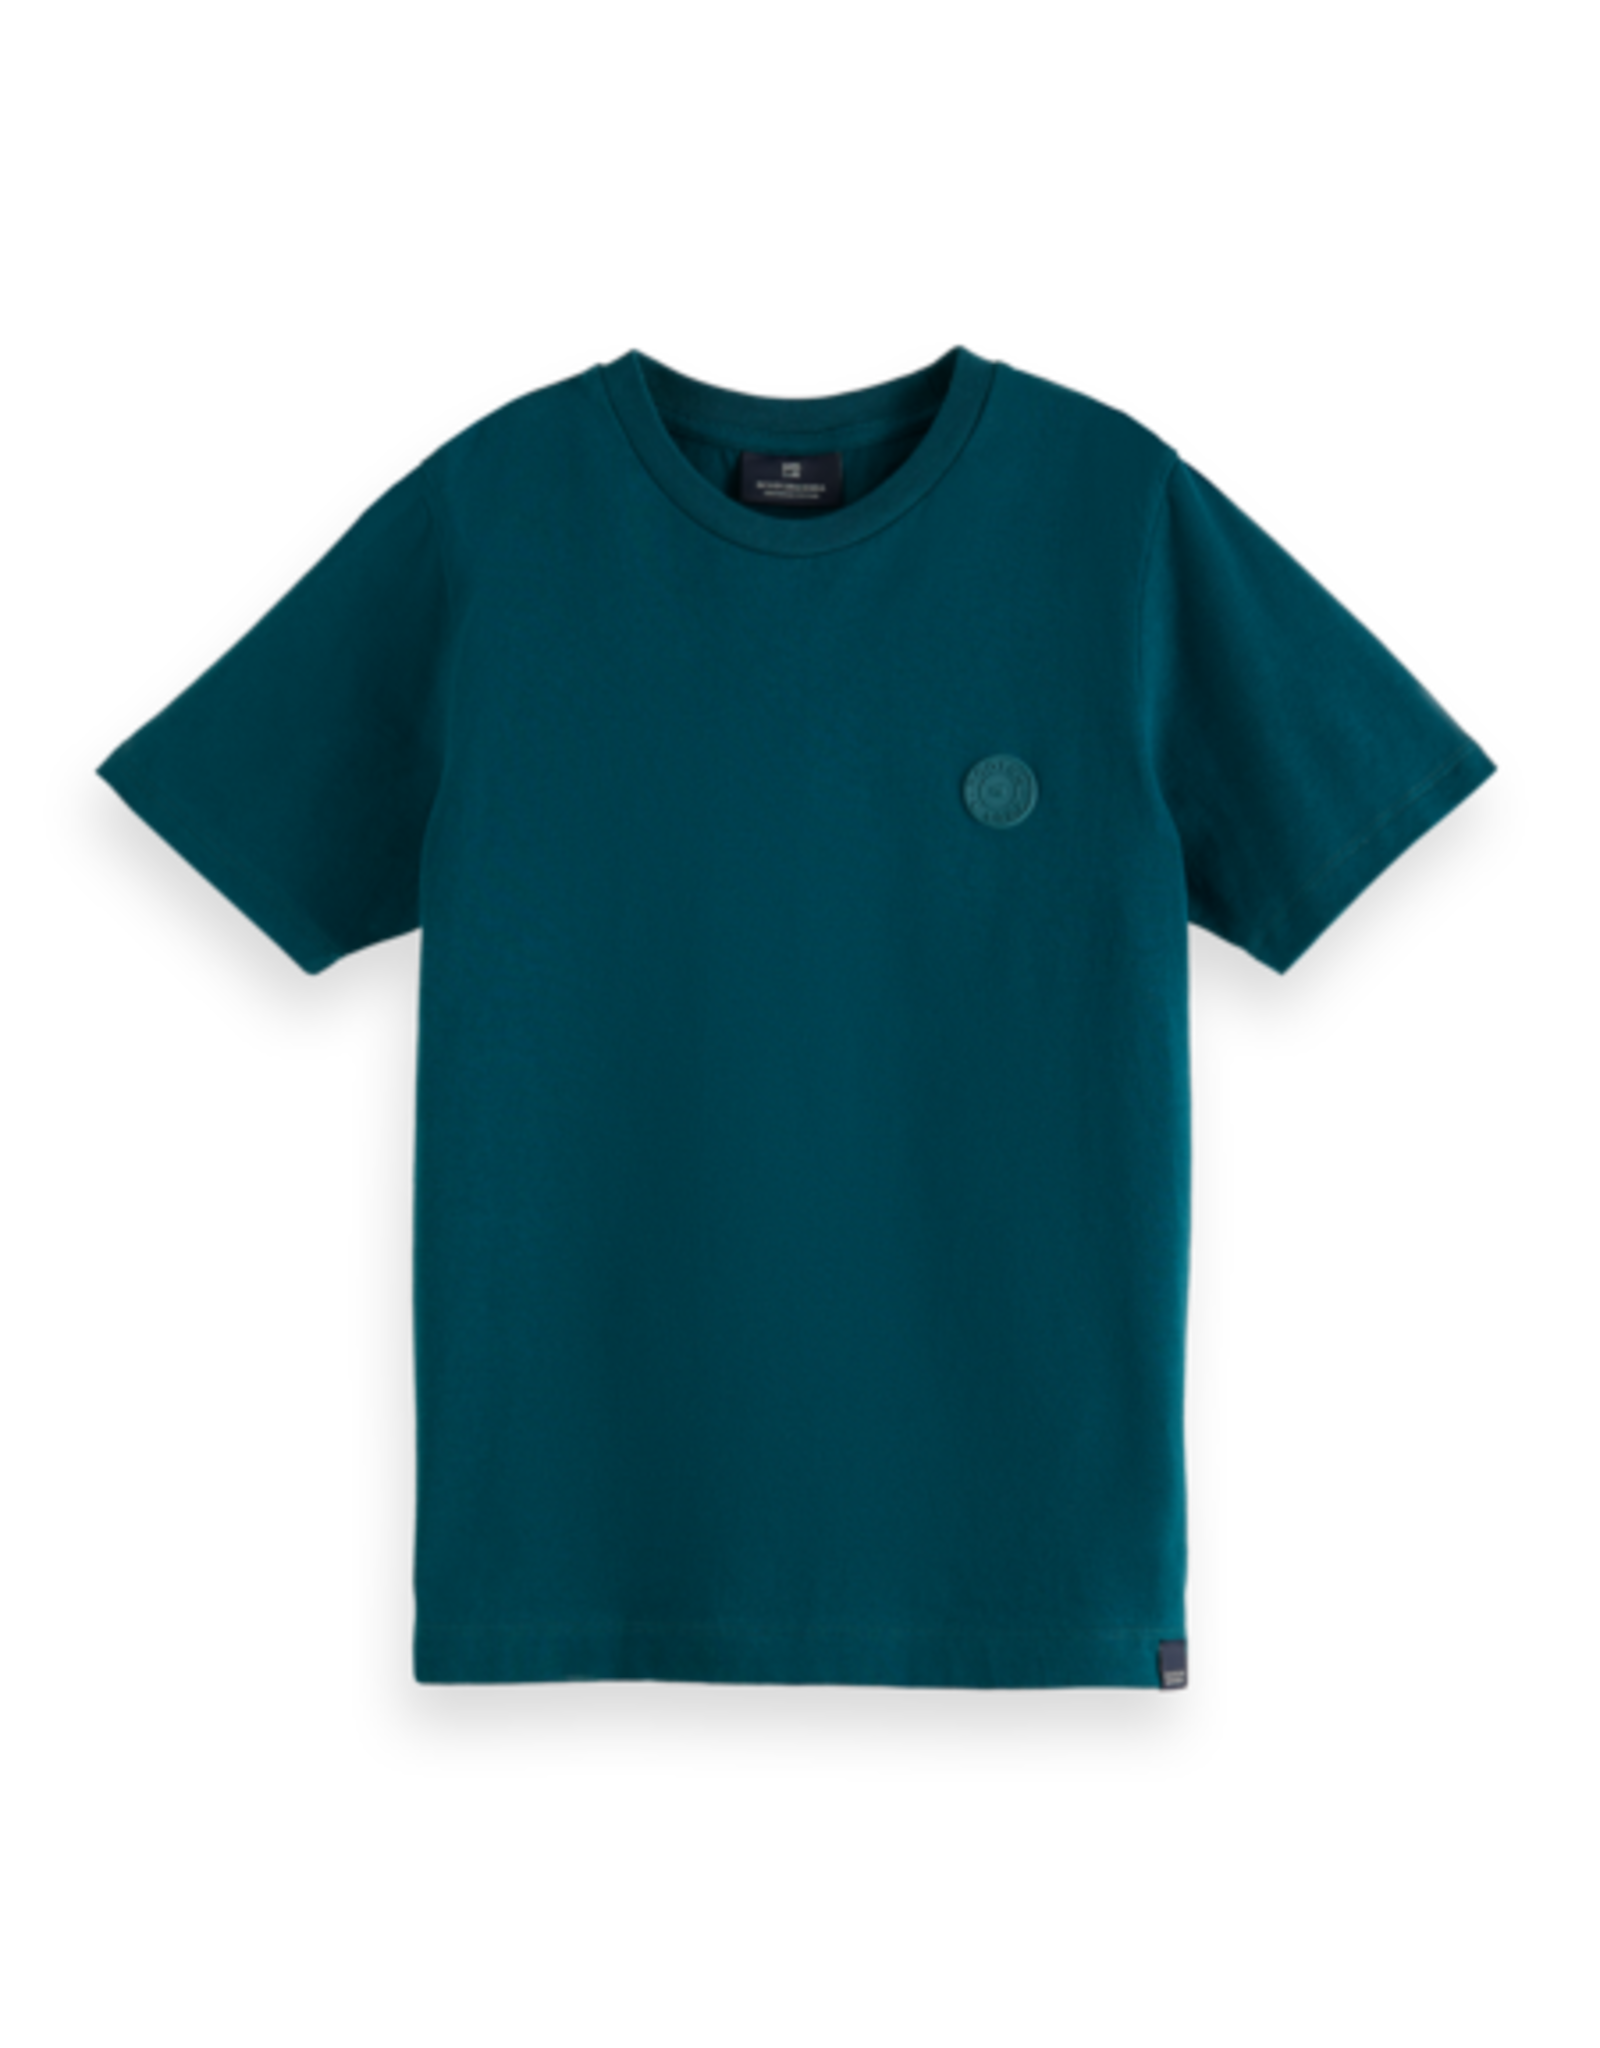 Scotch & Soda Scotch Shrunk donkergroen t-shirt